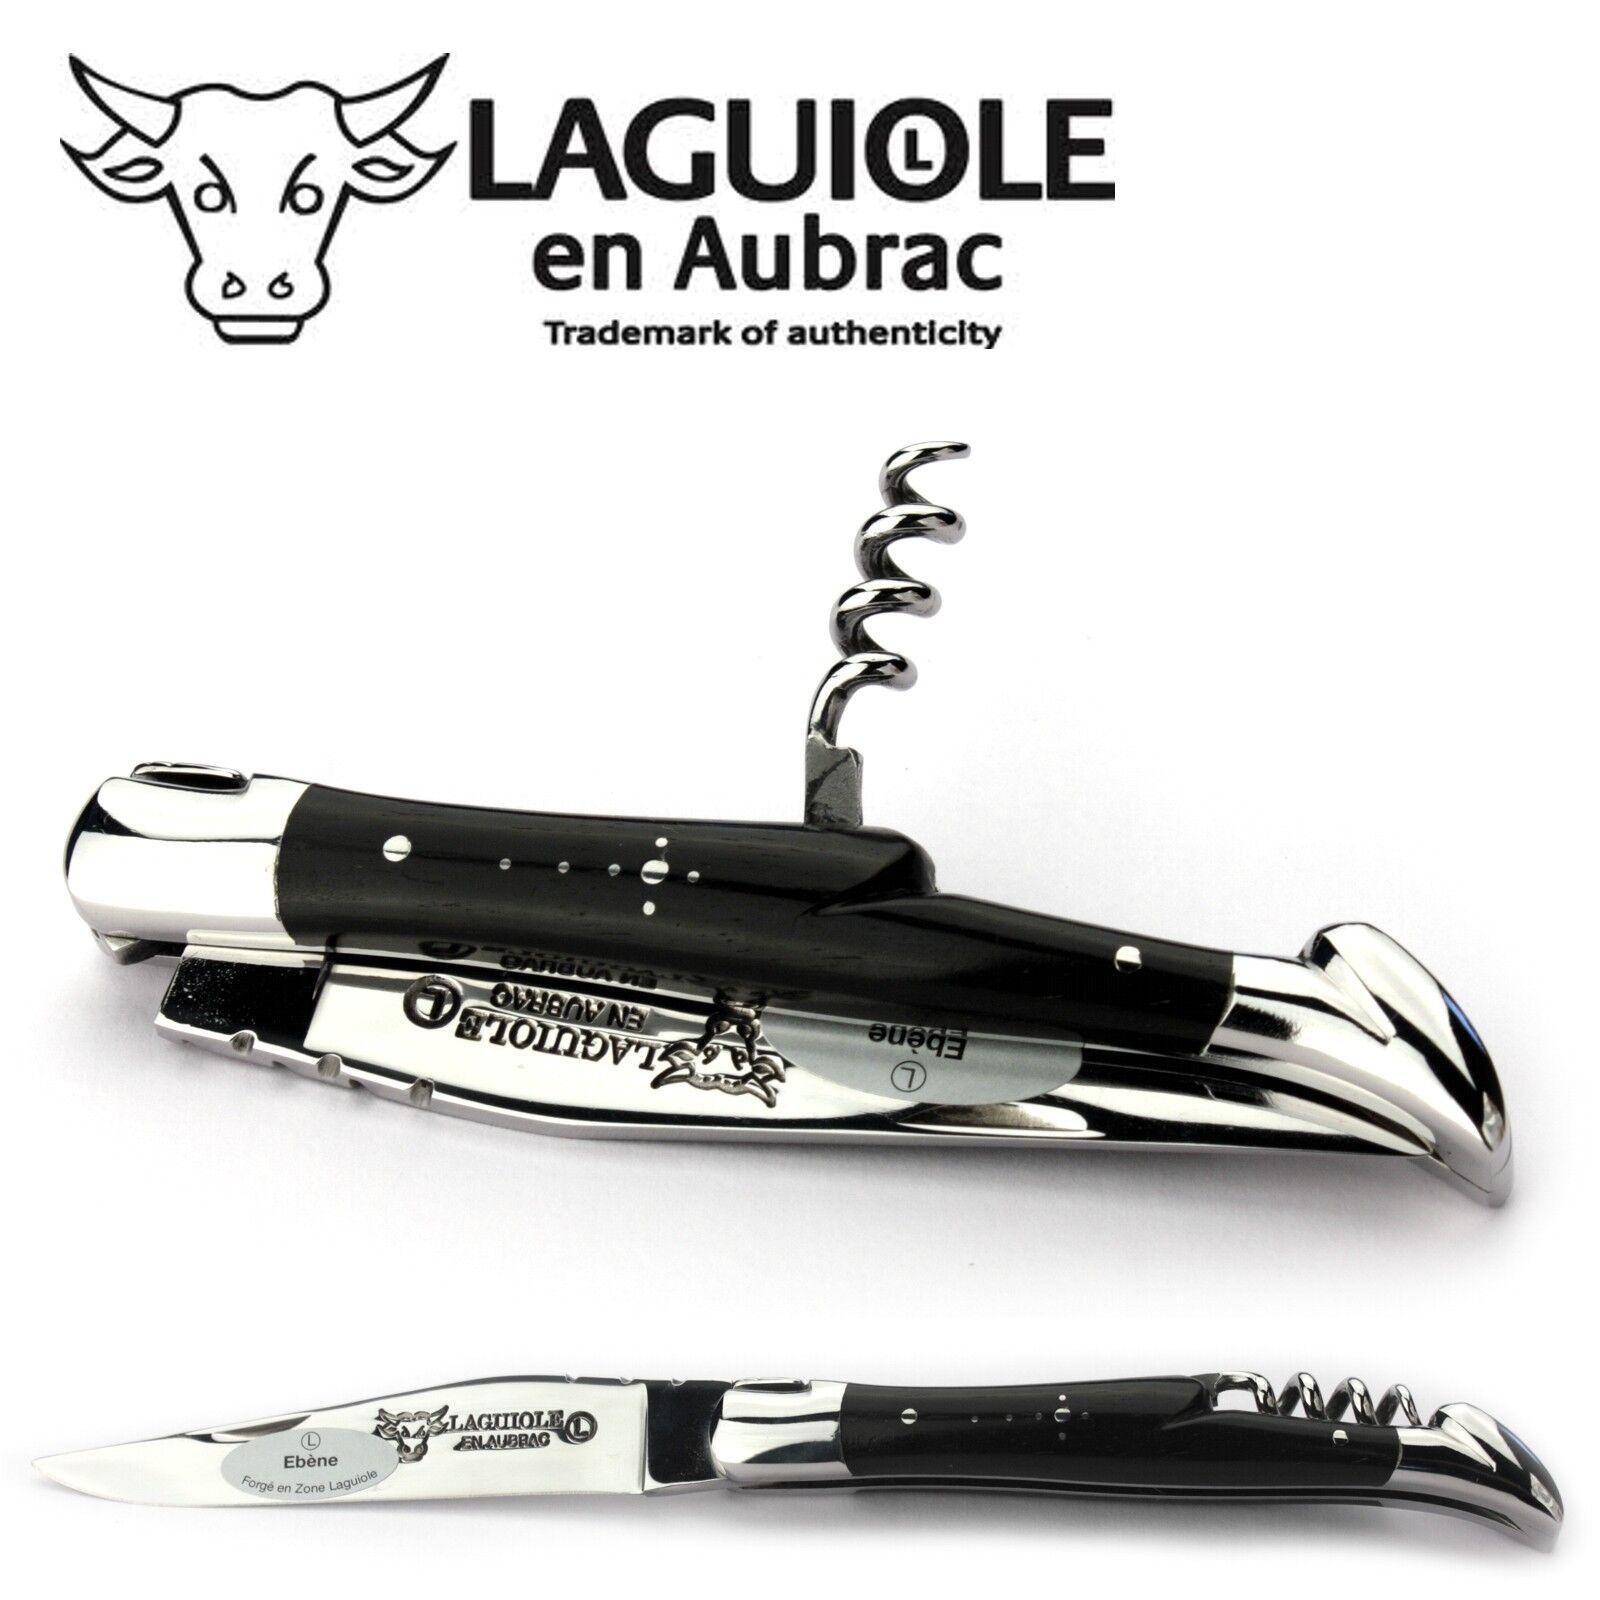 Laguiole en Aubrac Taschenmesser Ebenholz Korkenzieher L0311EBIS 11 11 11 cm Messer 4b1299